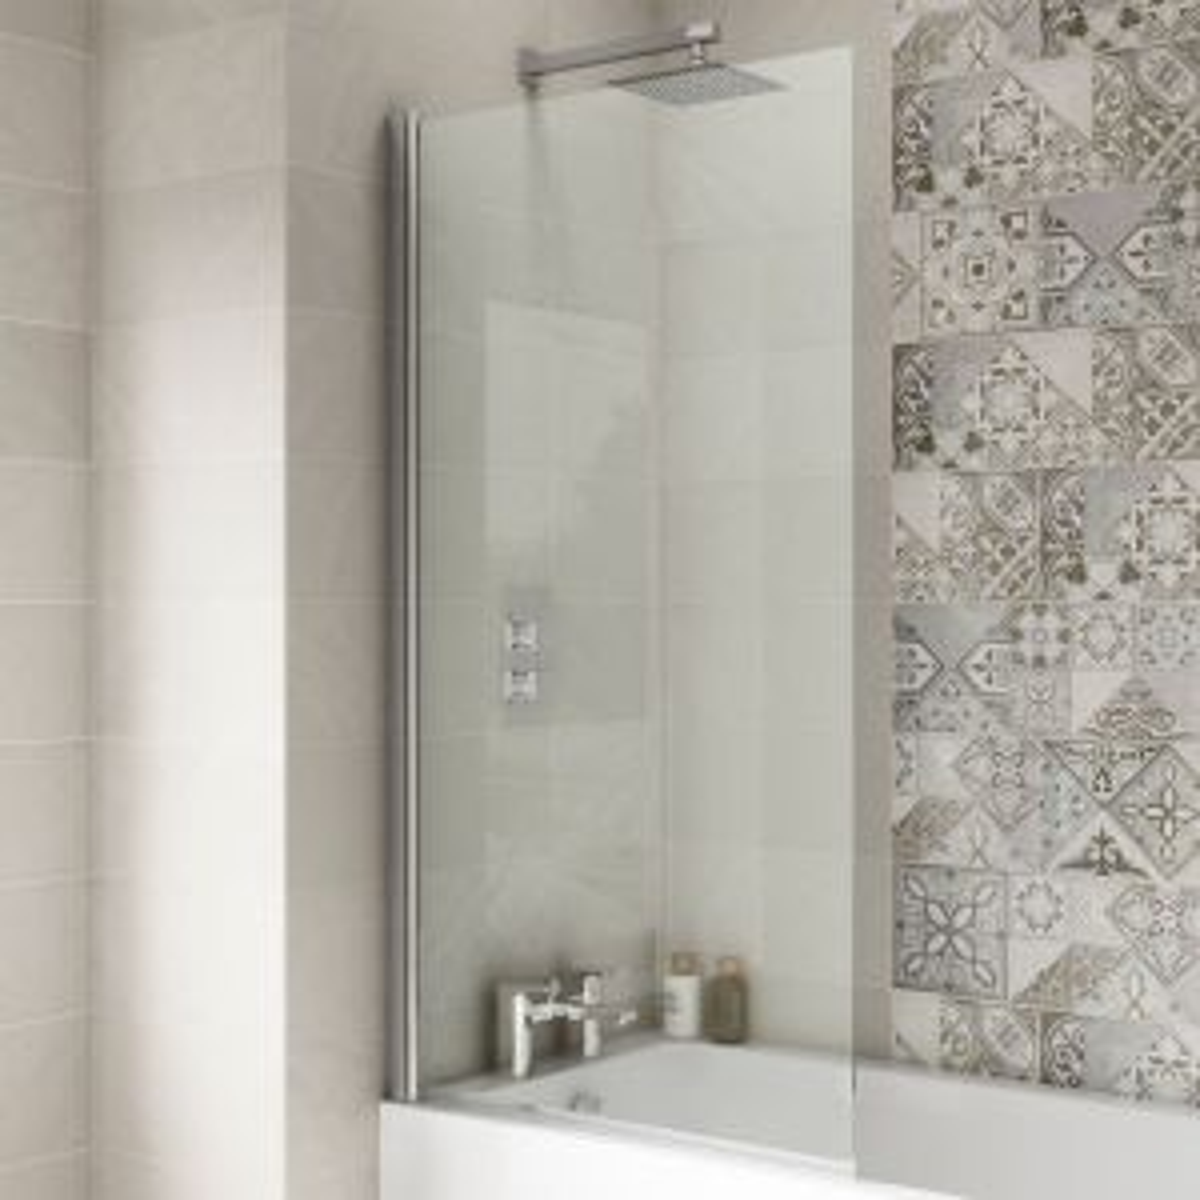 RAK Series 600 Shower Bath Suite Lifestyle